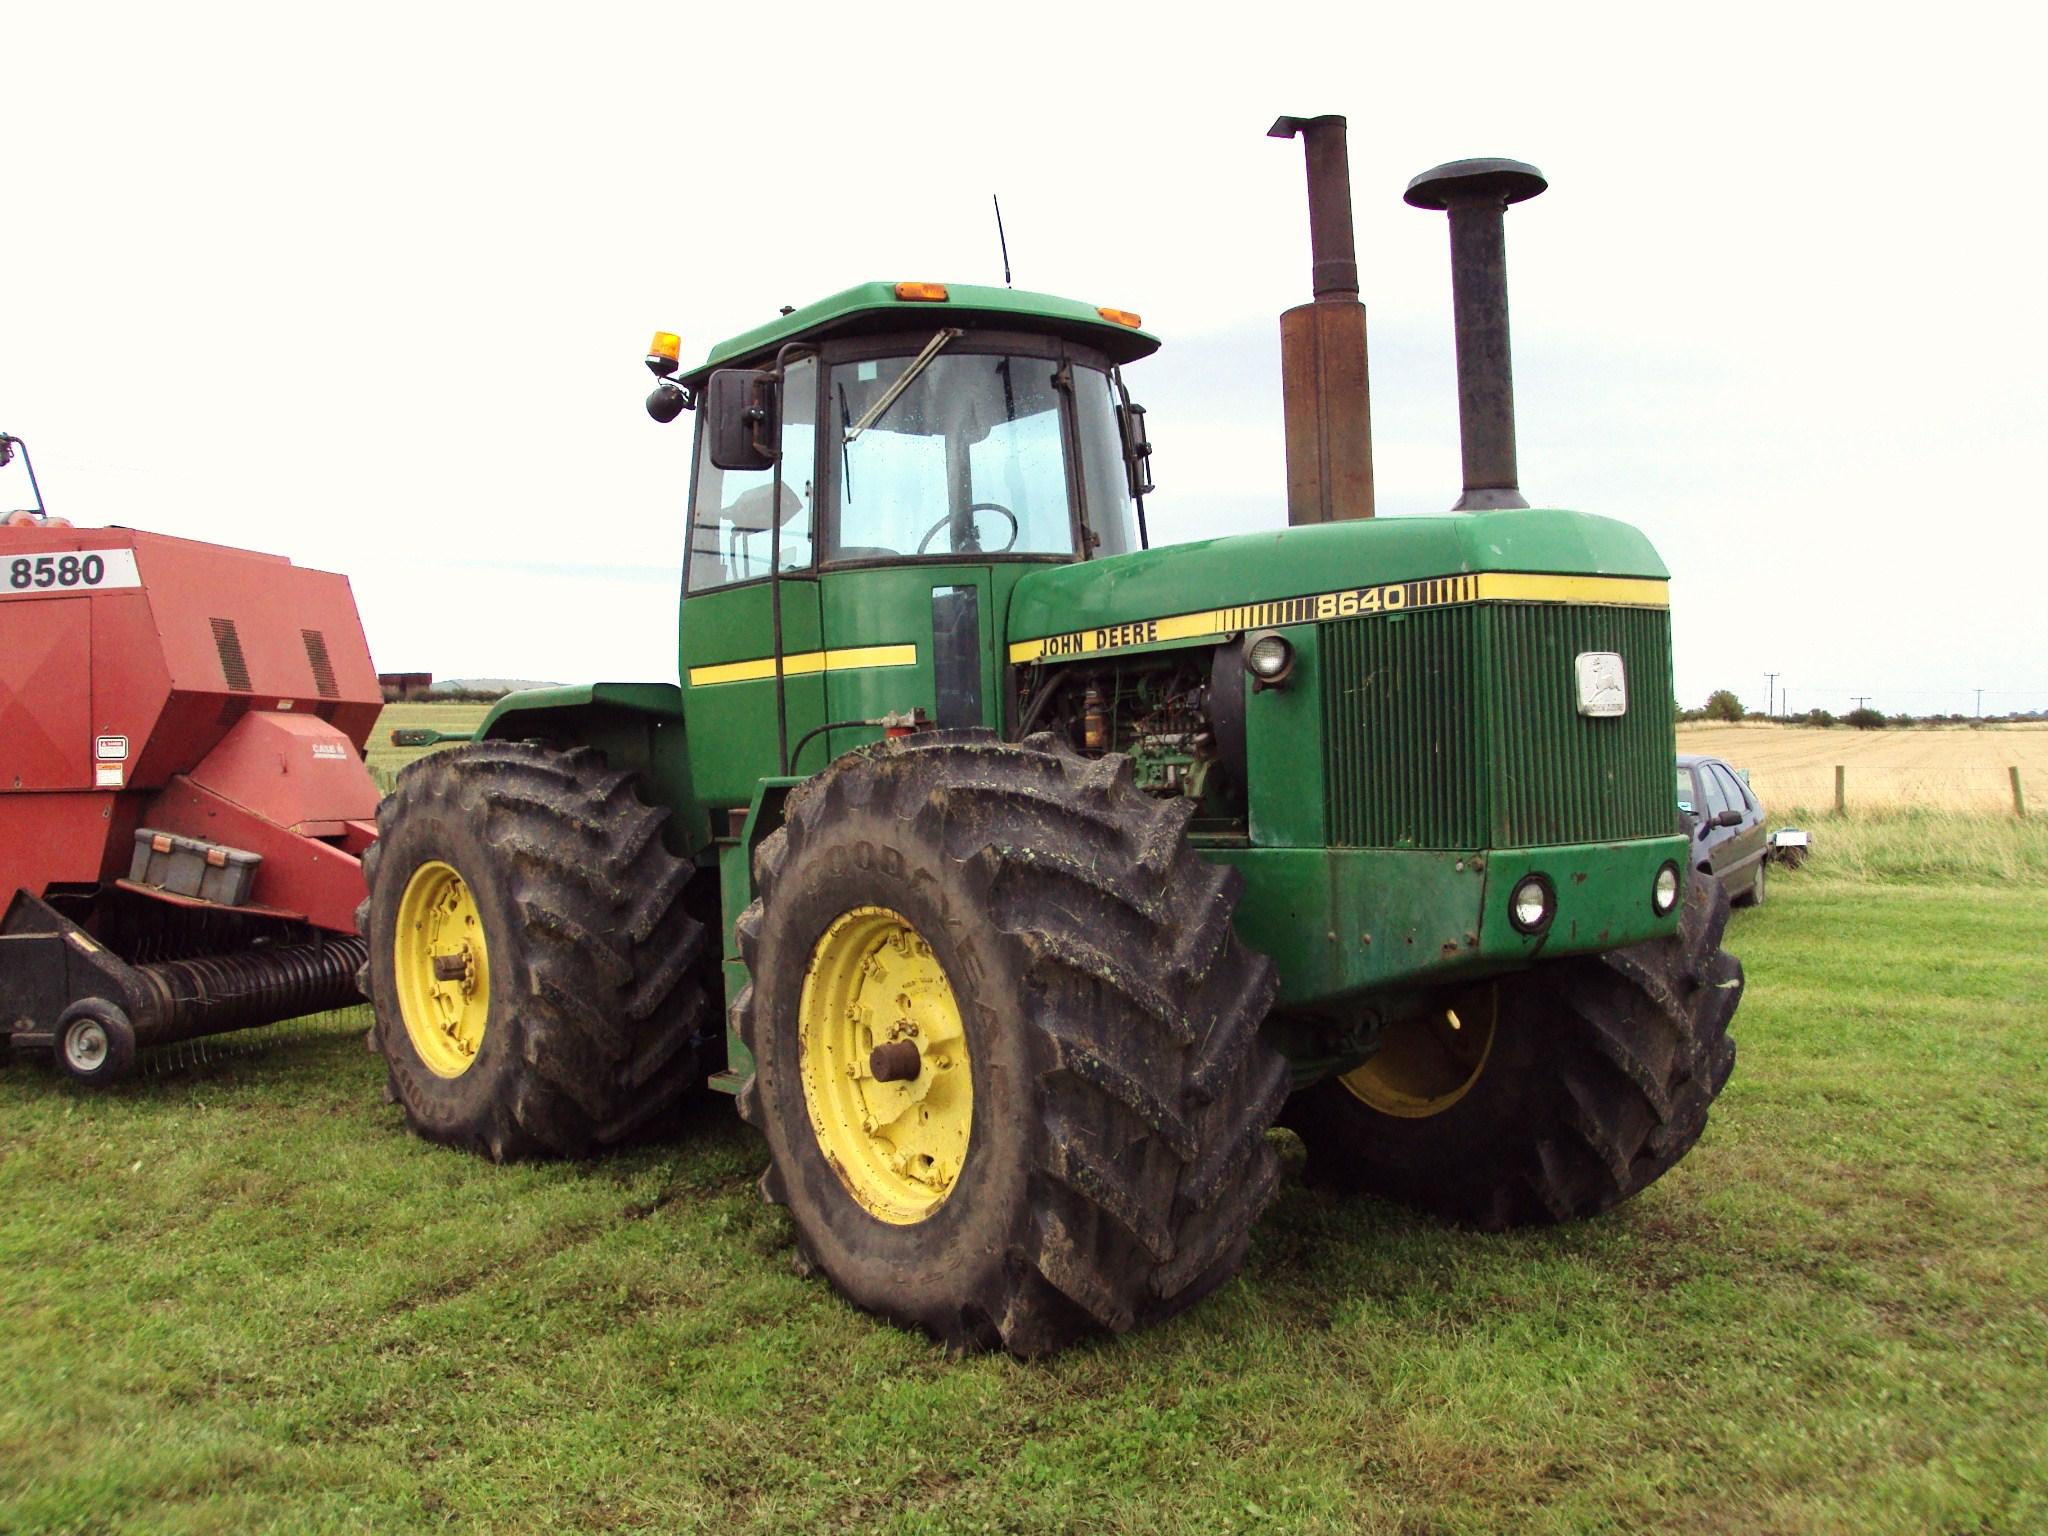 List Of John Deere Tractors Tractor Construction Plant Wiki Farm 2240 Wiring Diagram 8640